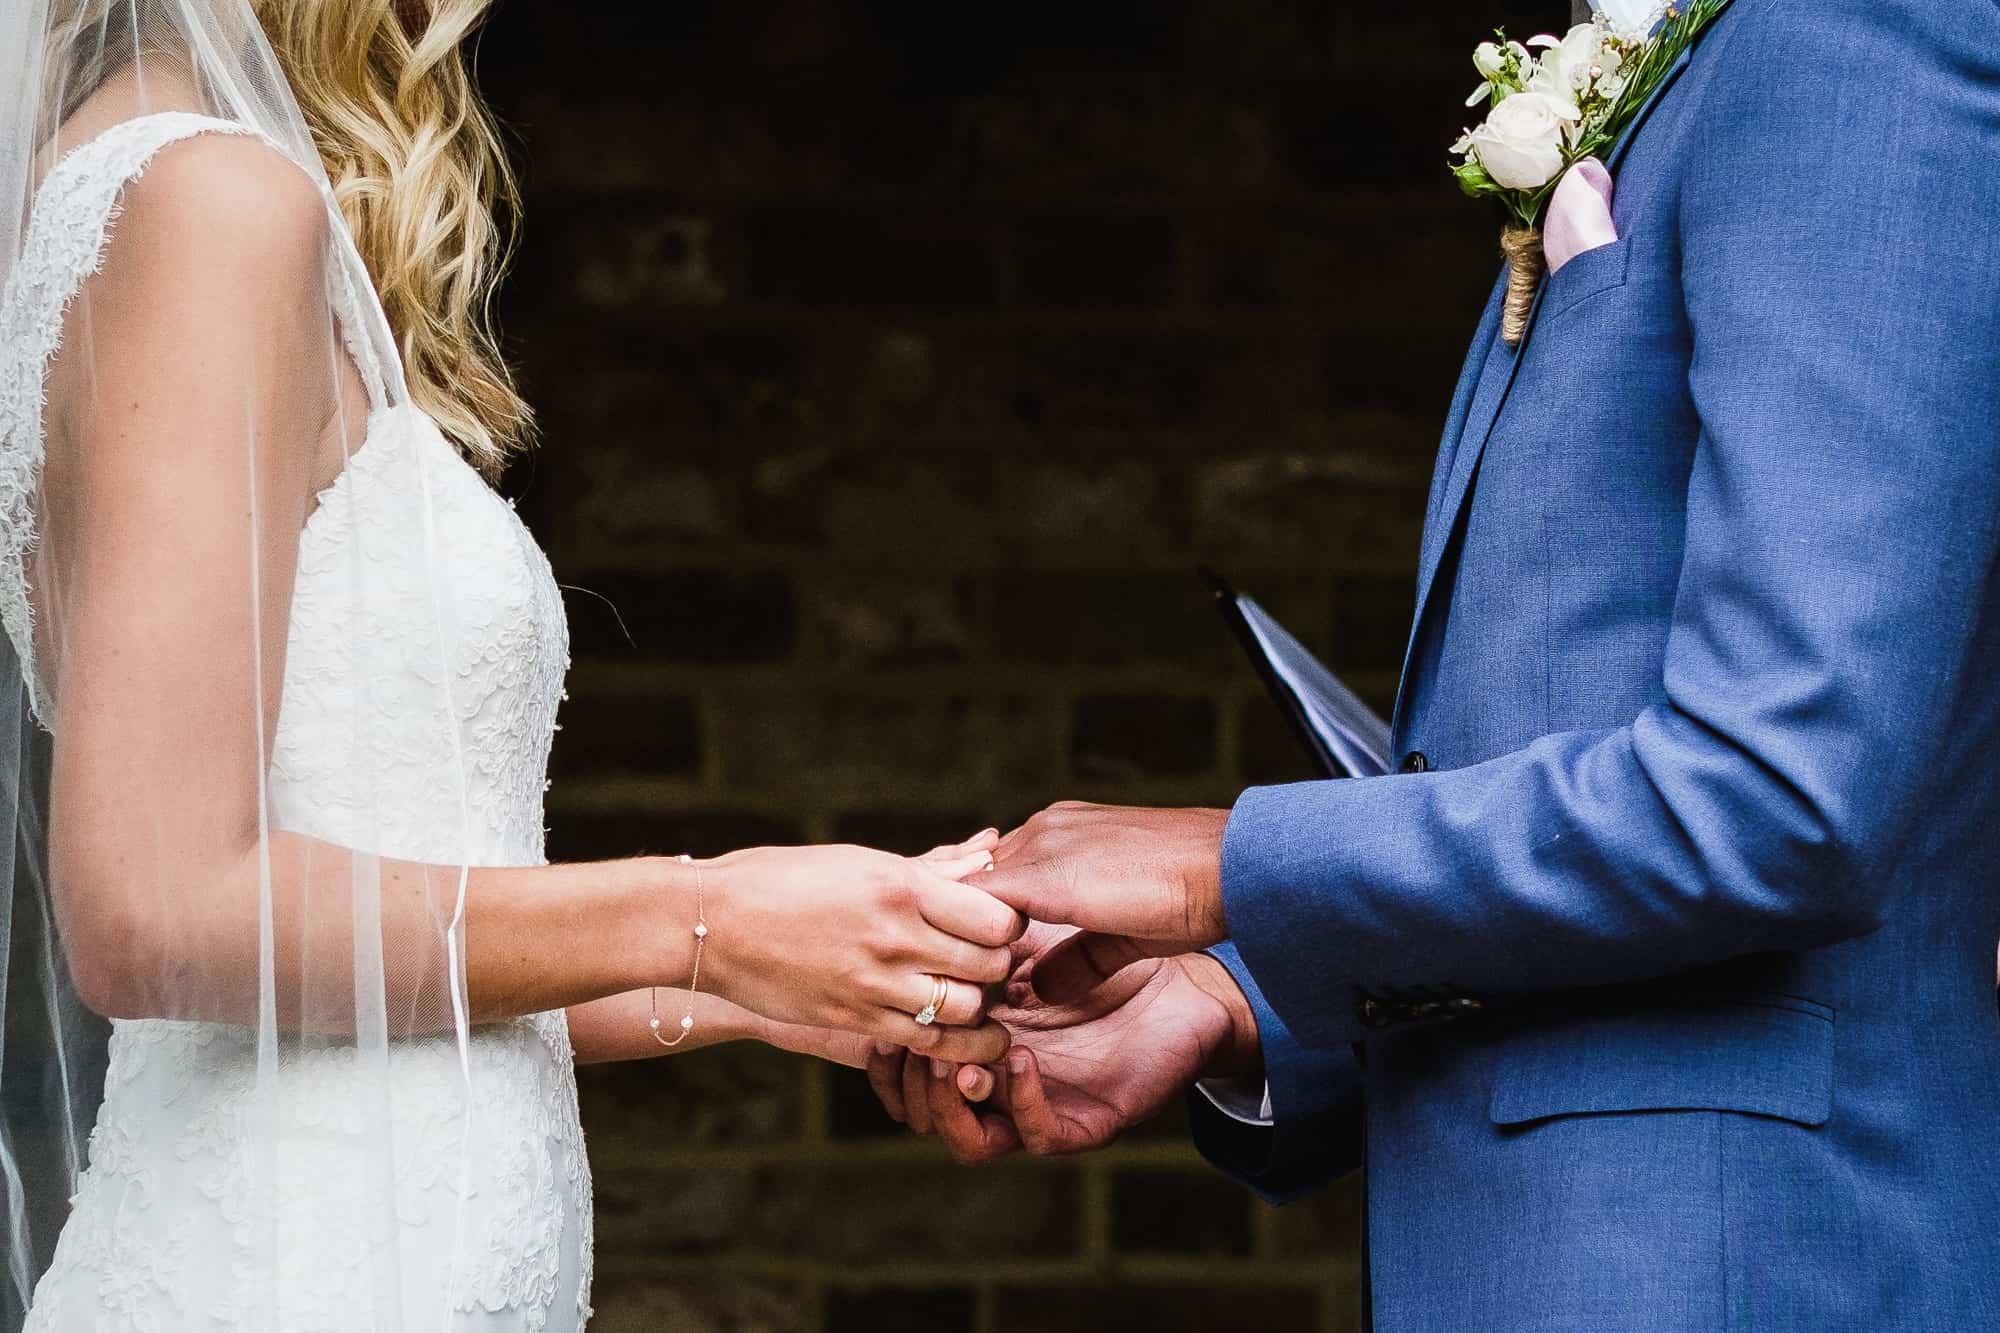 marleybrook-house-wedding-photography-matt-tyler-0029